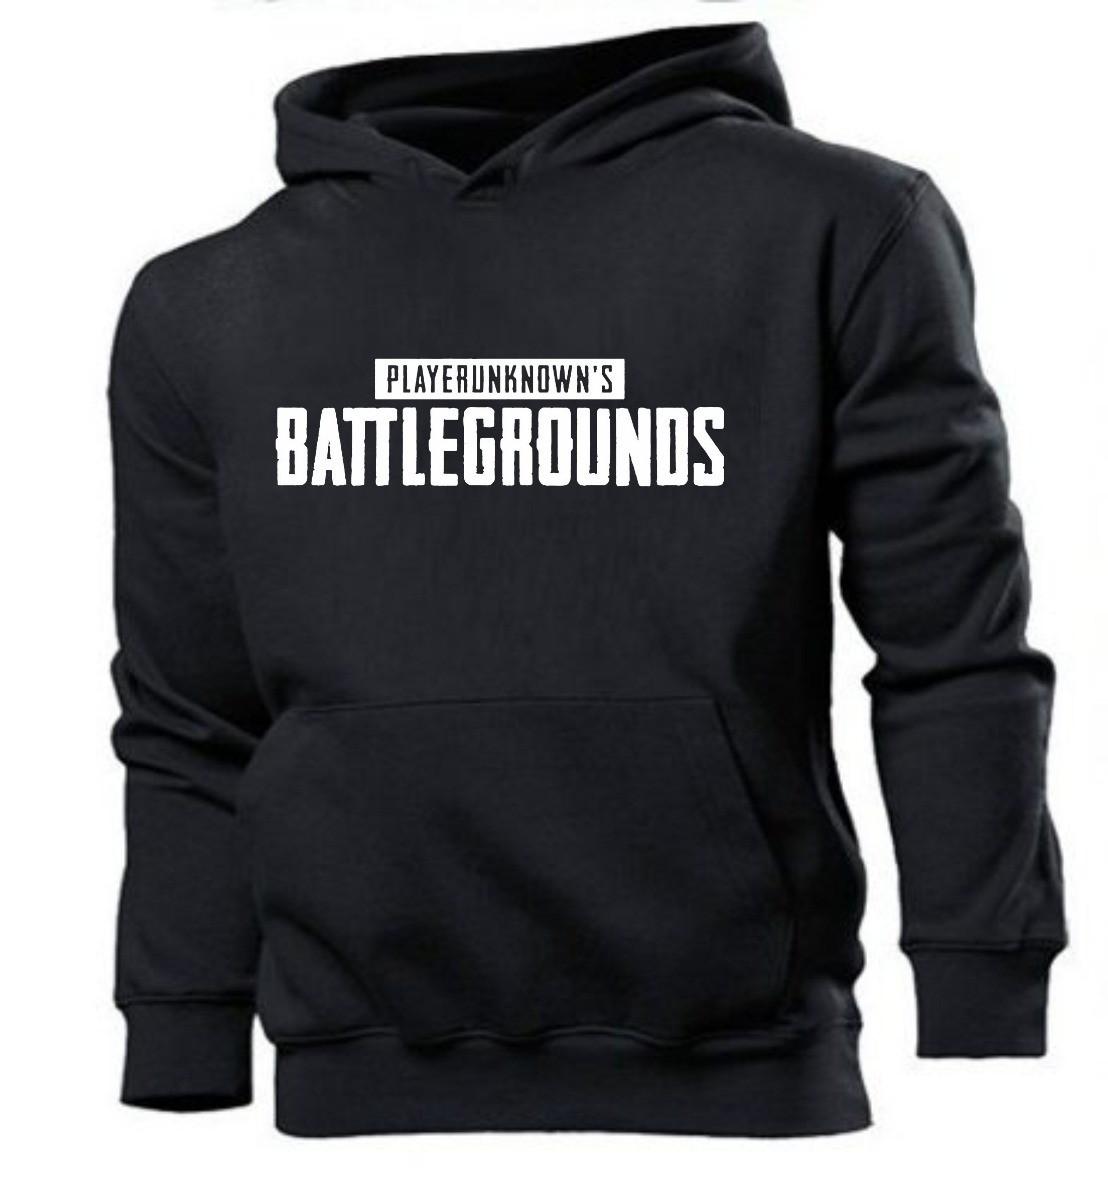 Blusa Moleton Canguru Pubg Playerunknown s Battlegrounds no Elo7 ... ce8c876a50d